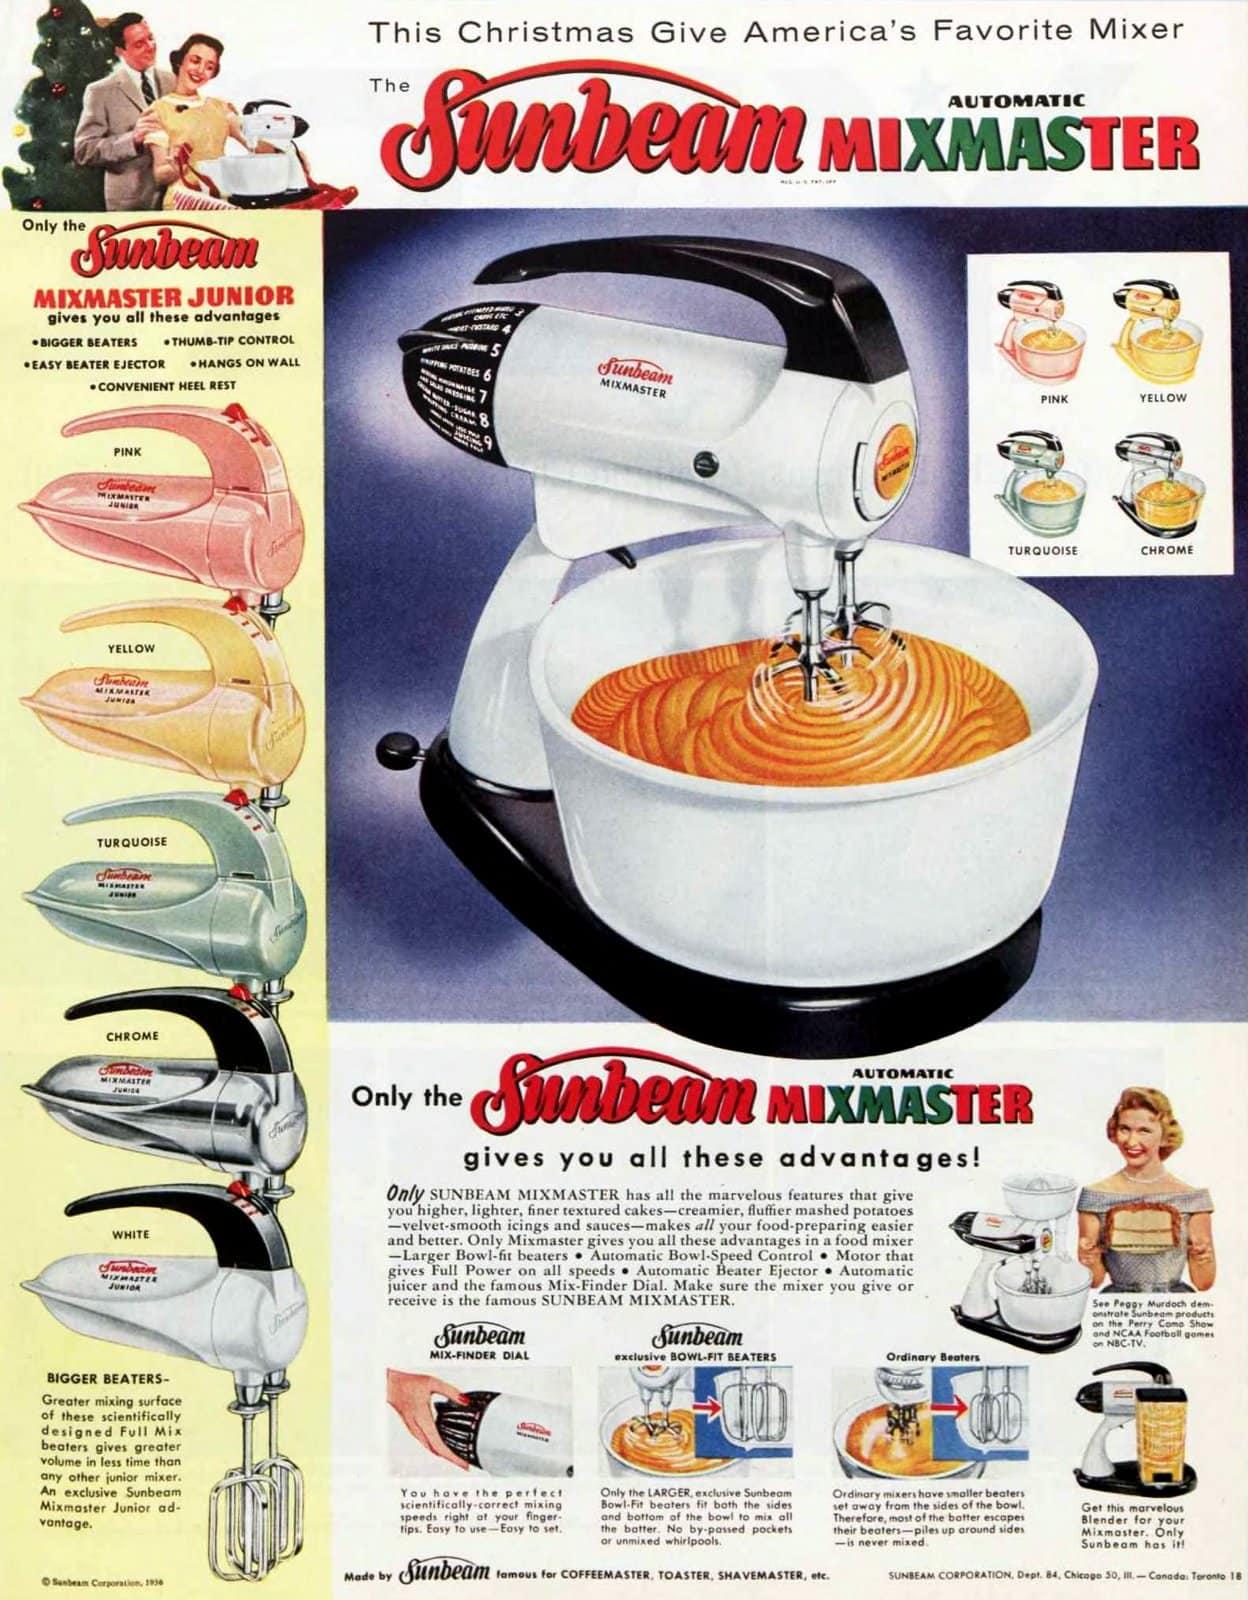 Vintage Sunbeam Mixmaster table mixer (1956)